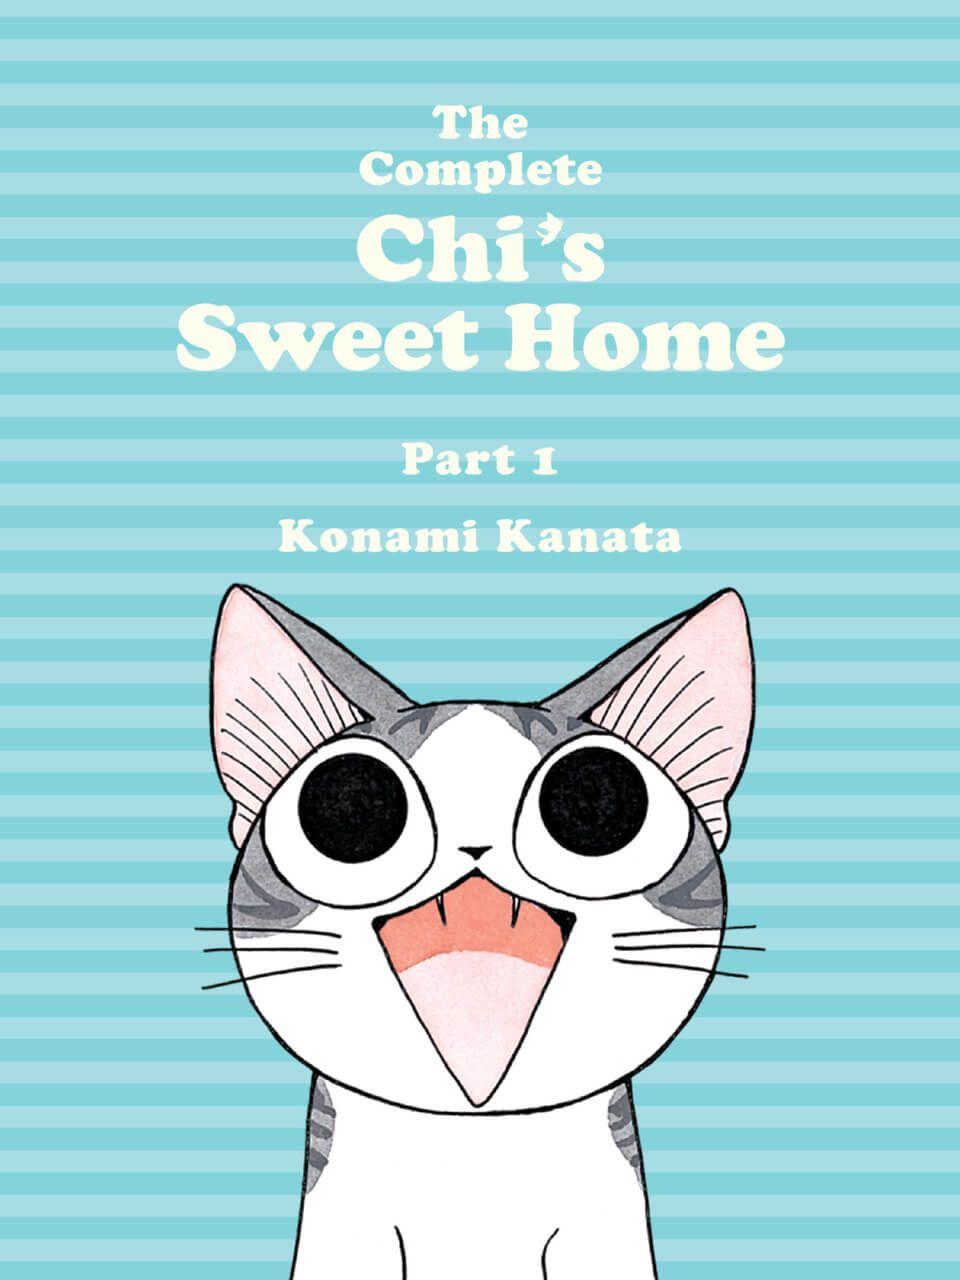 The Complete Chi's Sweet Home, Part I: Konami Kanata